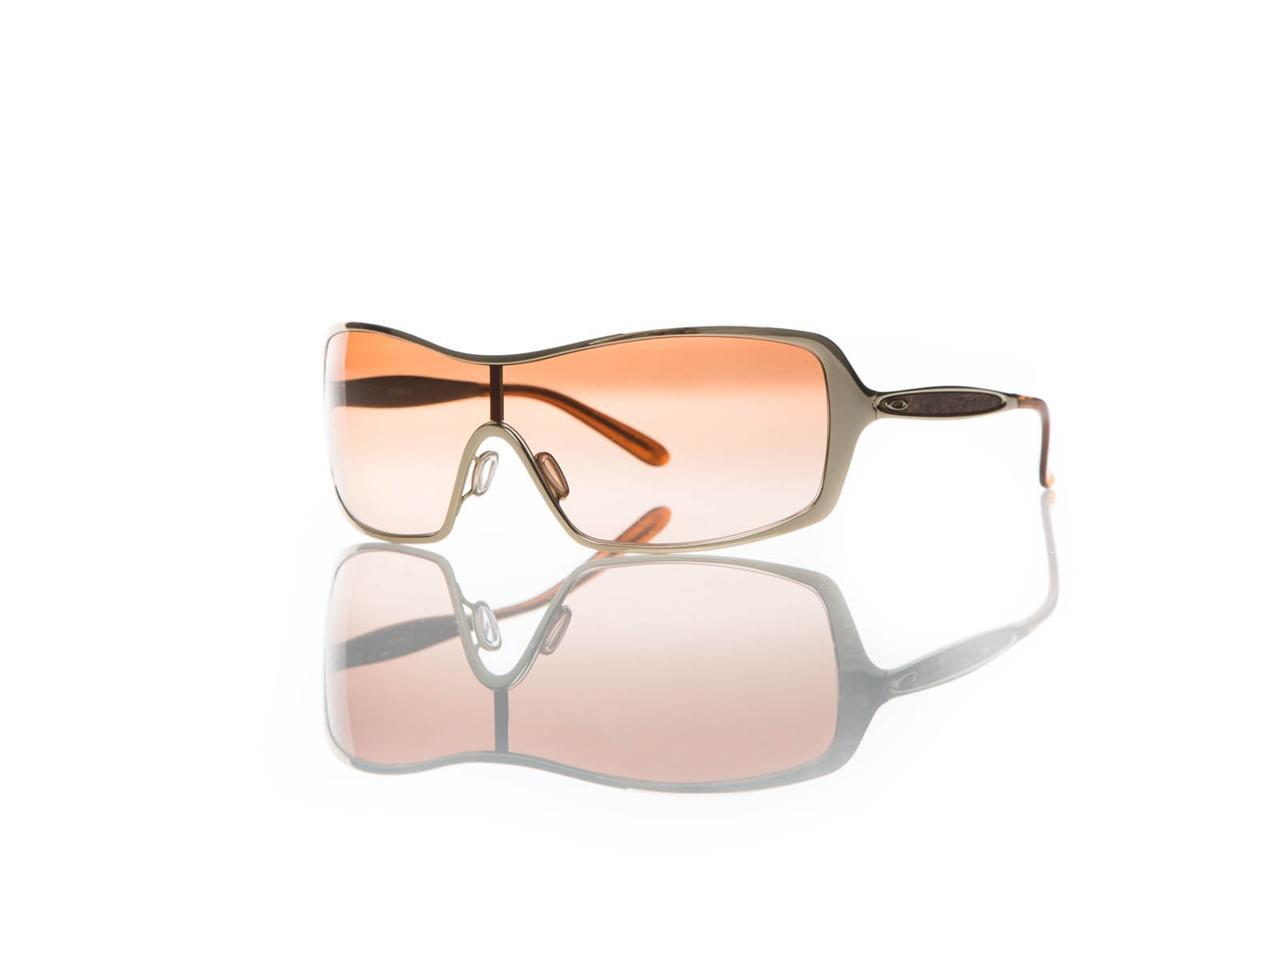 0c4aa10272fcc5 Oakley Remedy Sunglasses Review « Heritage Malta